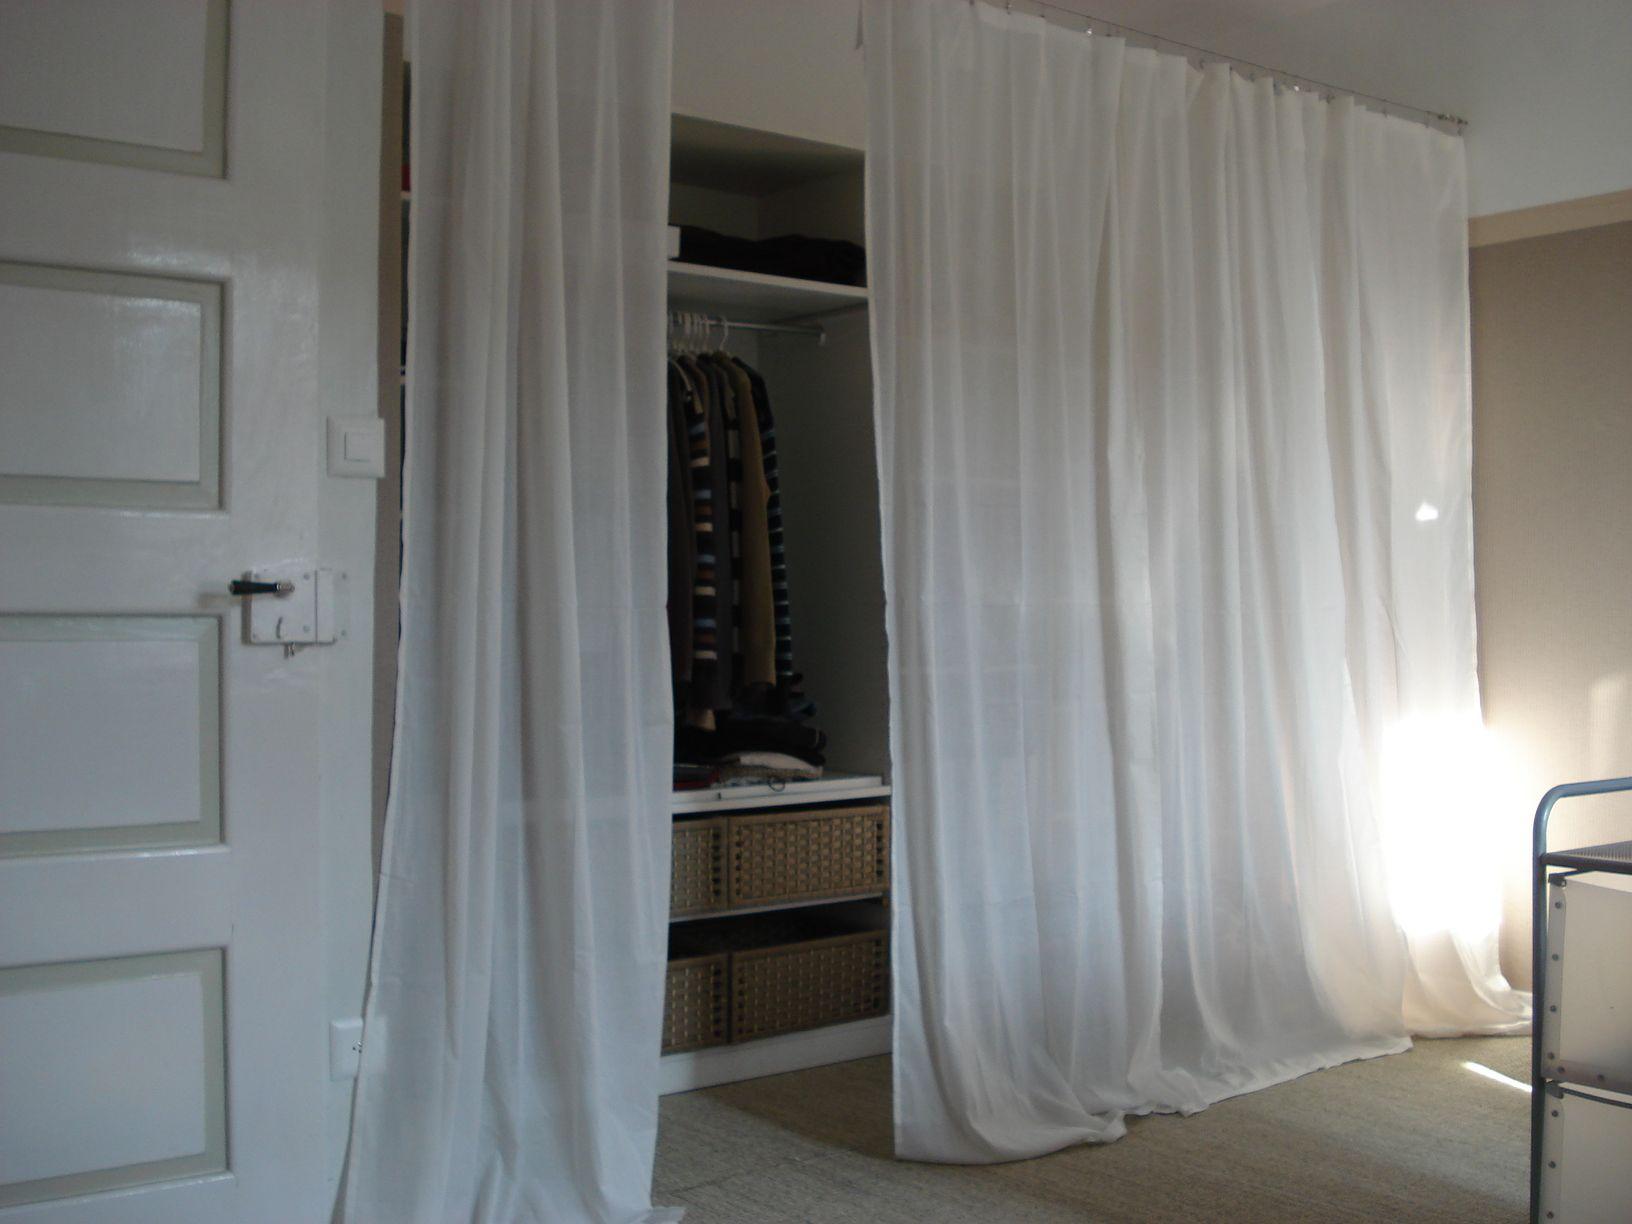 faire un dressing dressing in 2018 pinterest dressing. Black Bedroom Furniture Sets. Home Design Ideas